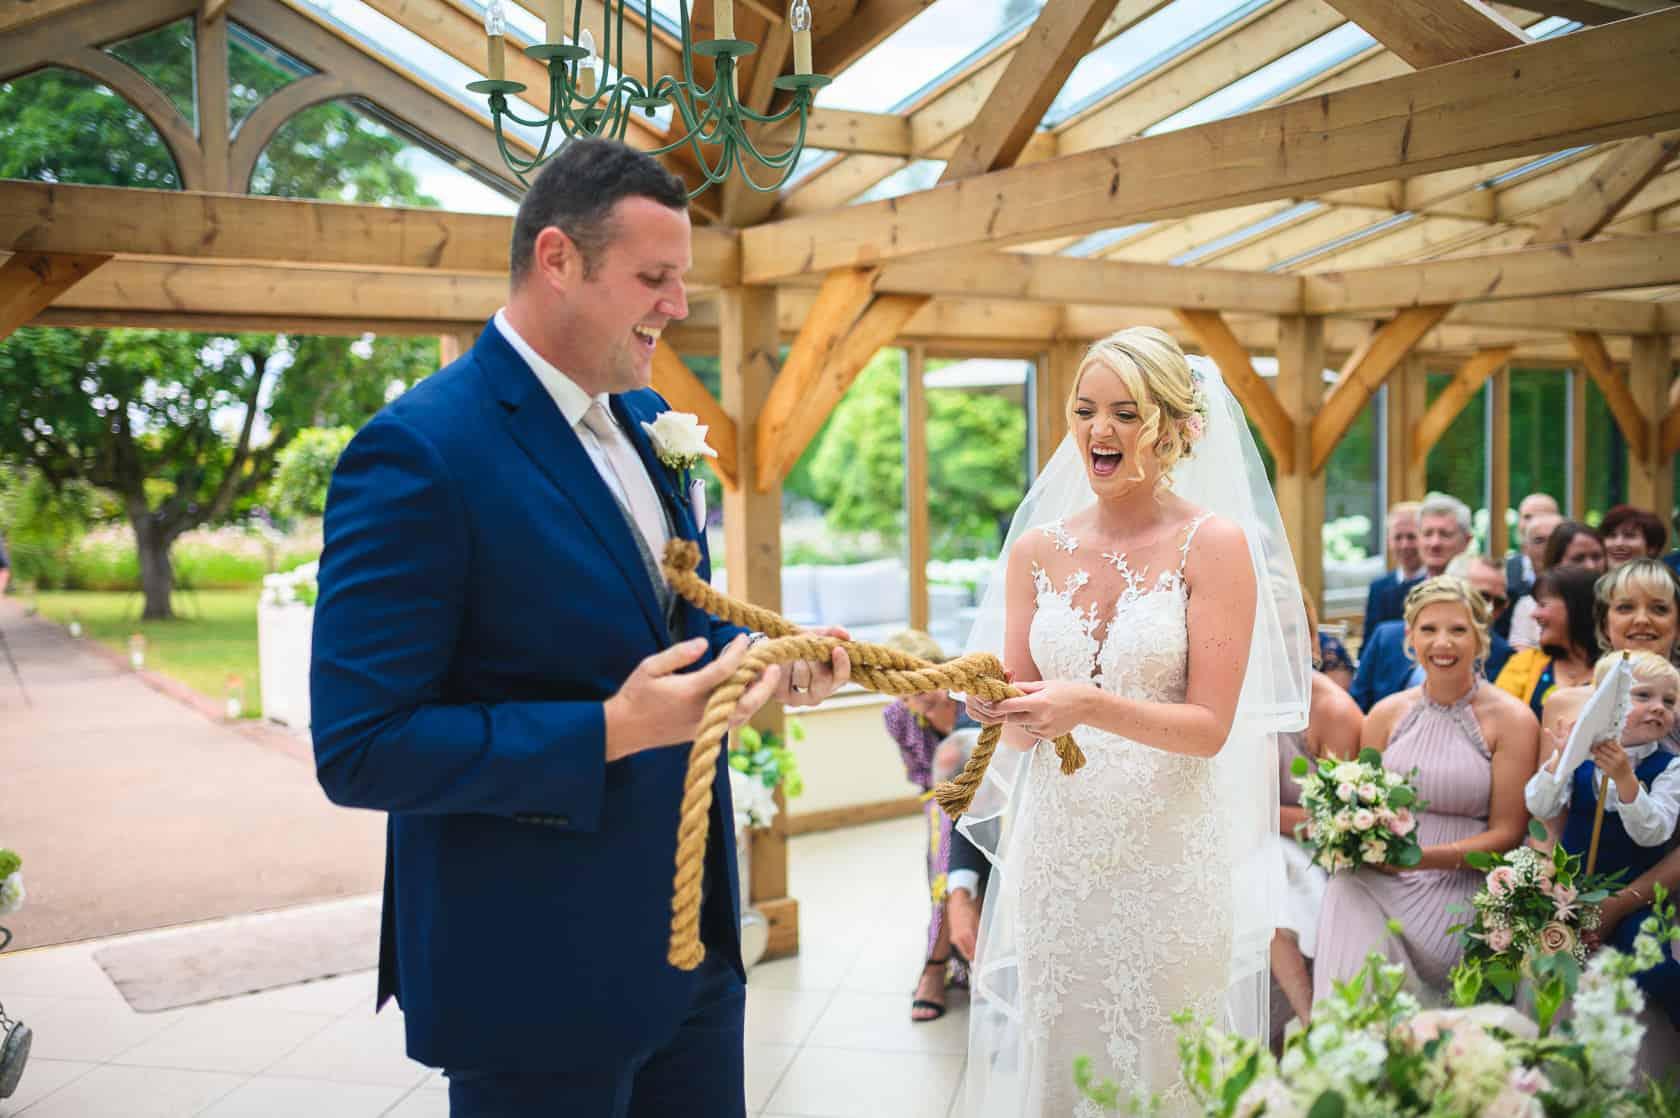 Best_Wedding_Photography_2019_Wedding-Photographer-Essex_041